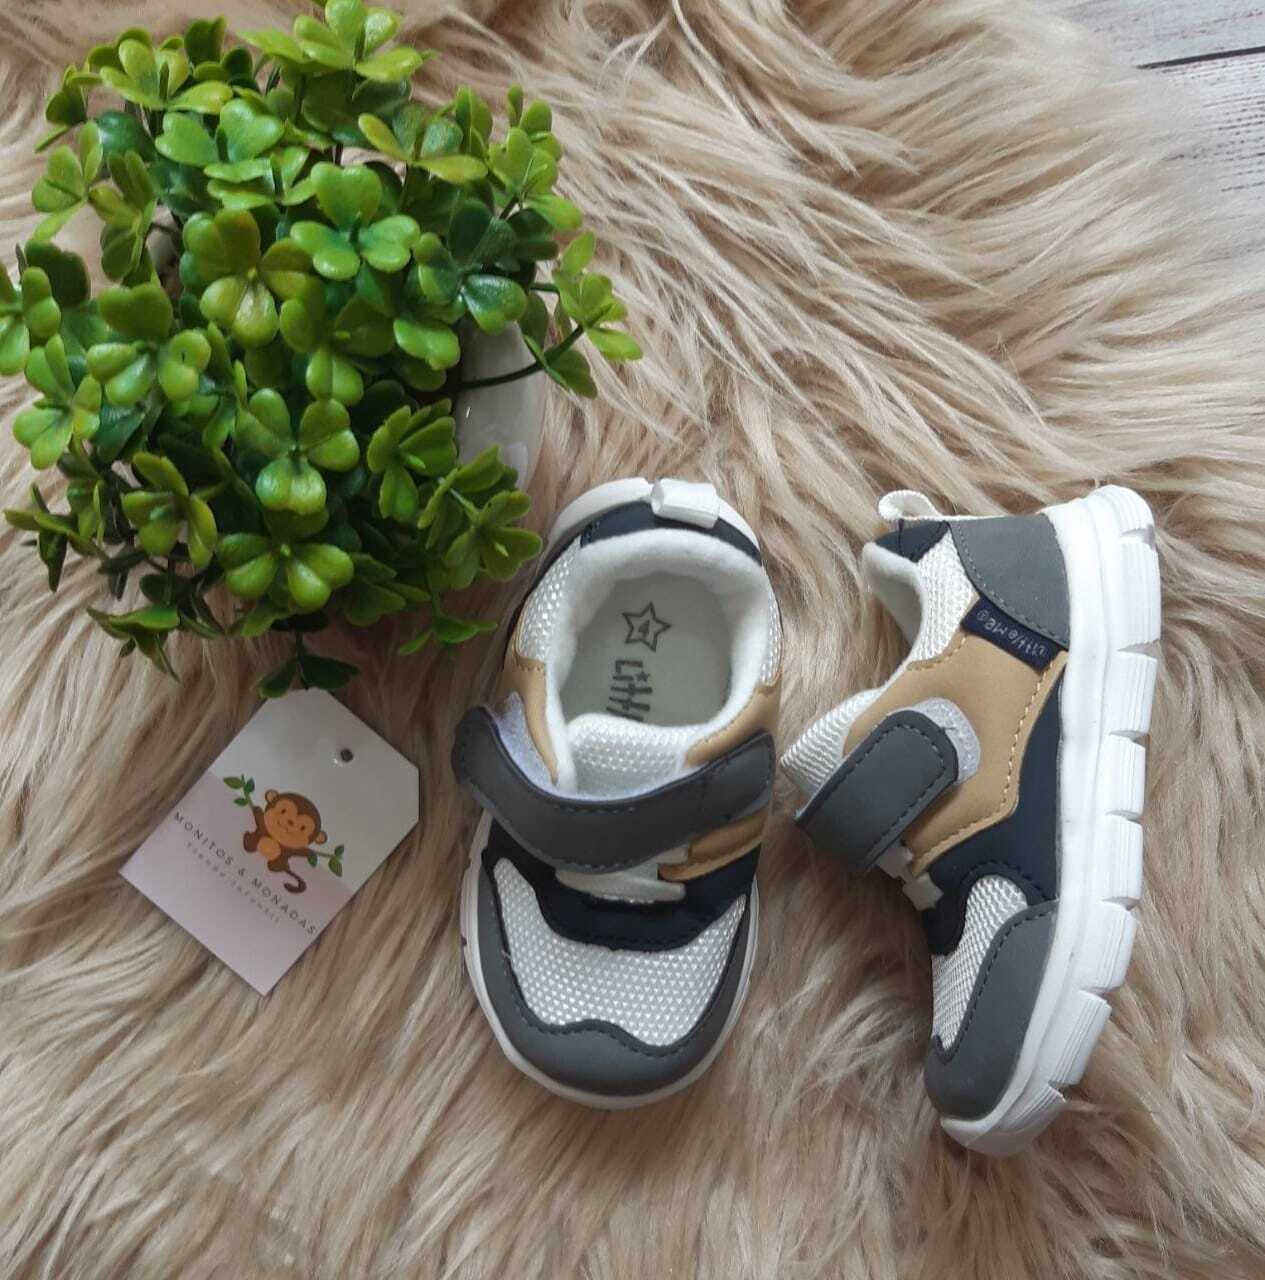 Zapatos Little Me, color blancos y grises, Talla 4us